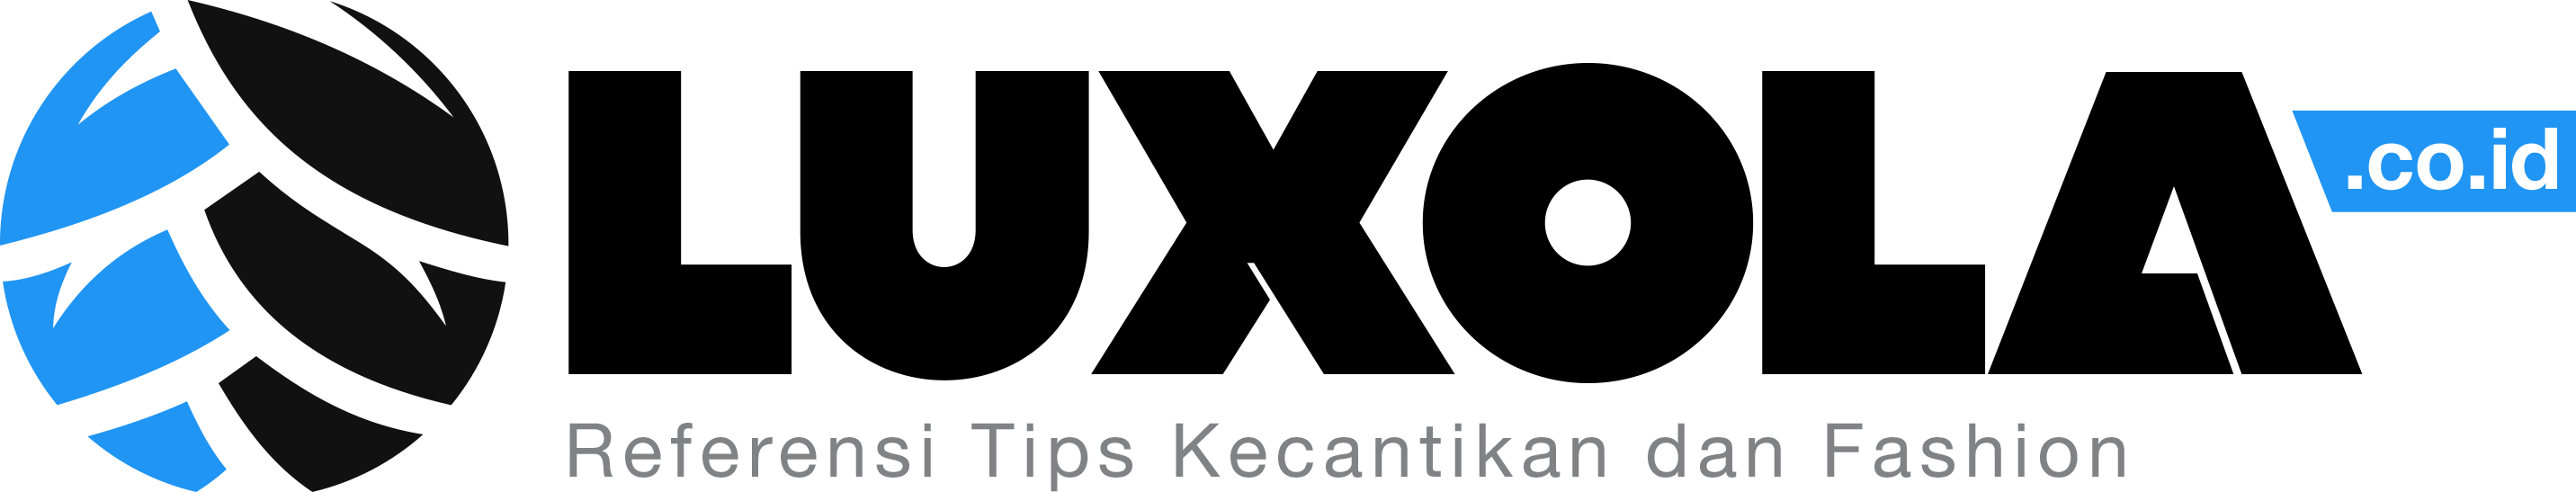 Portal Informasi Kesehatan